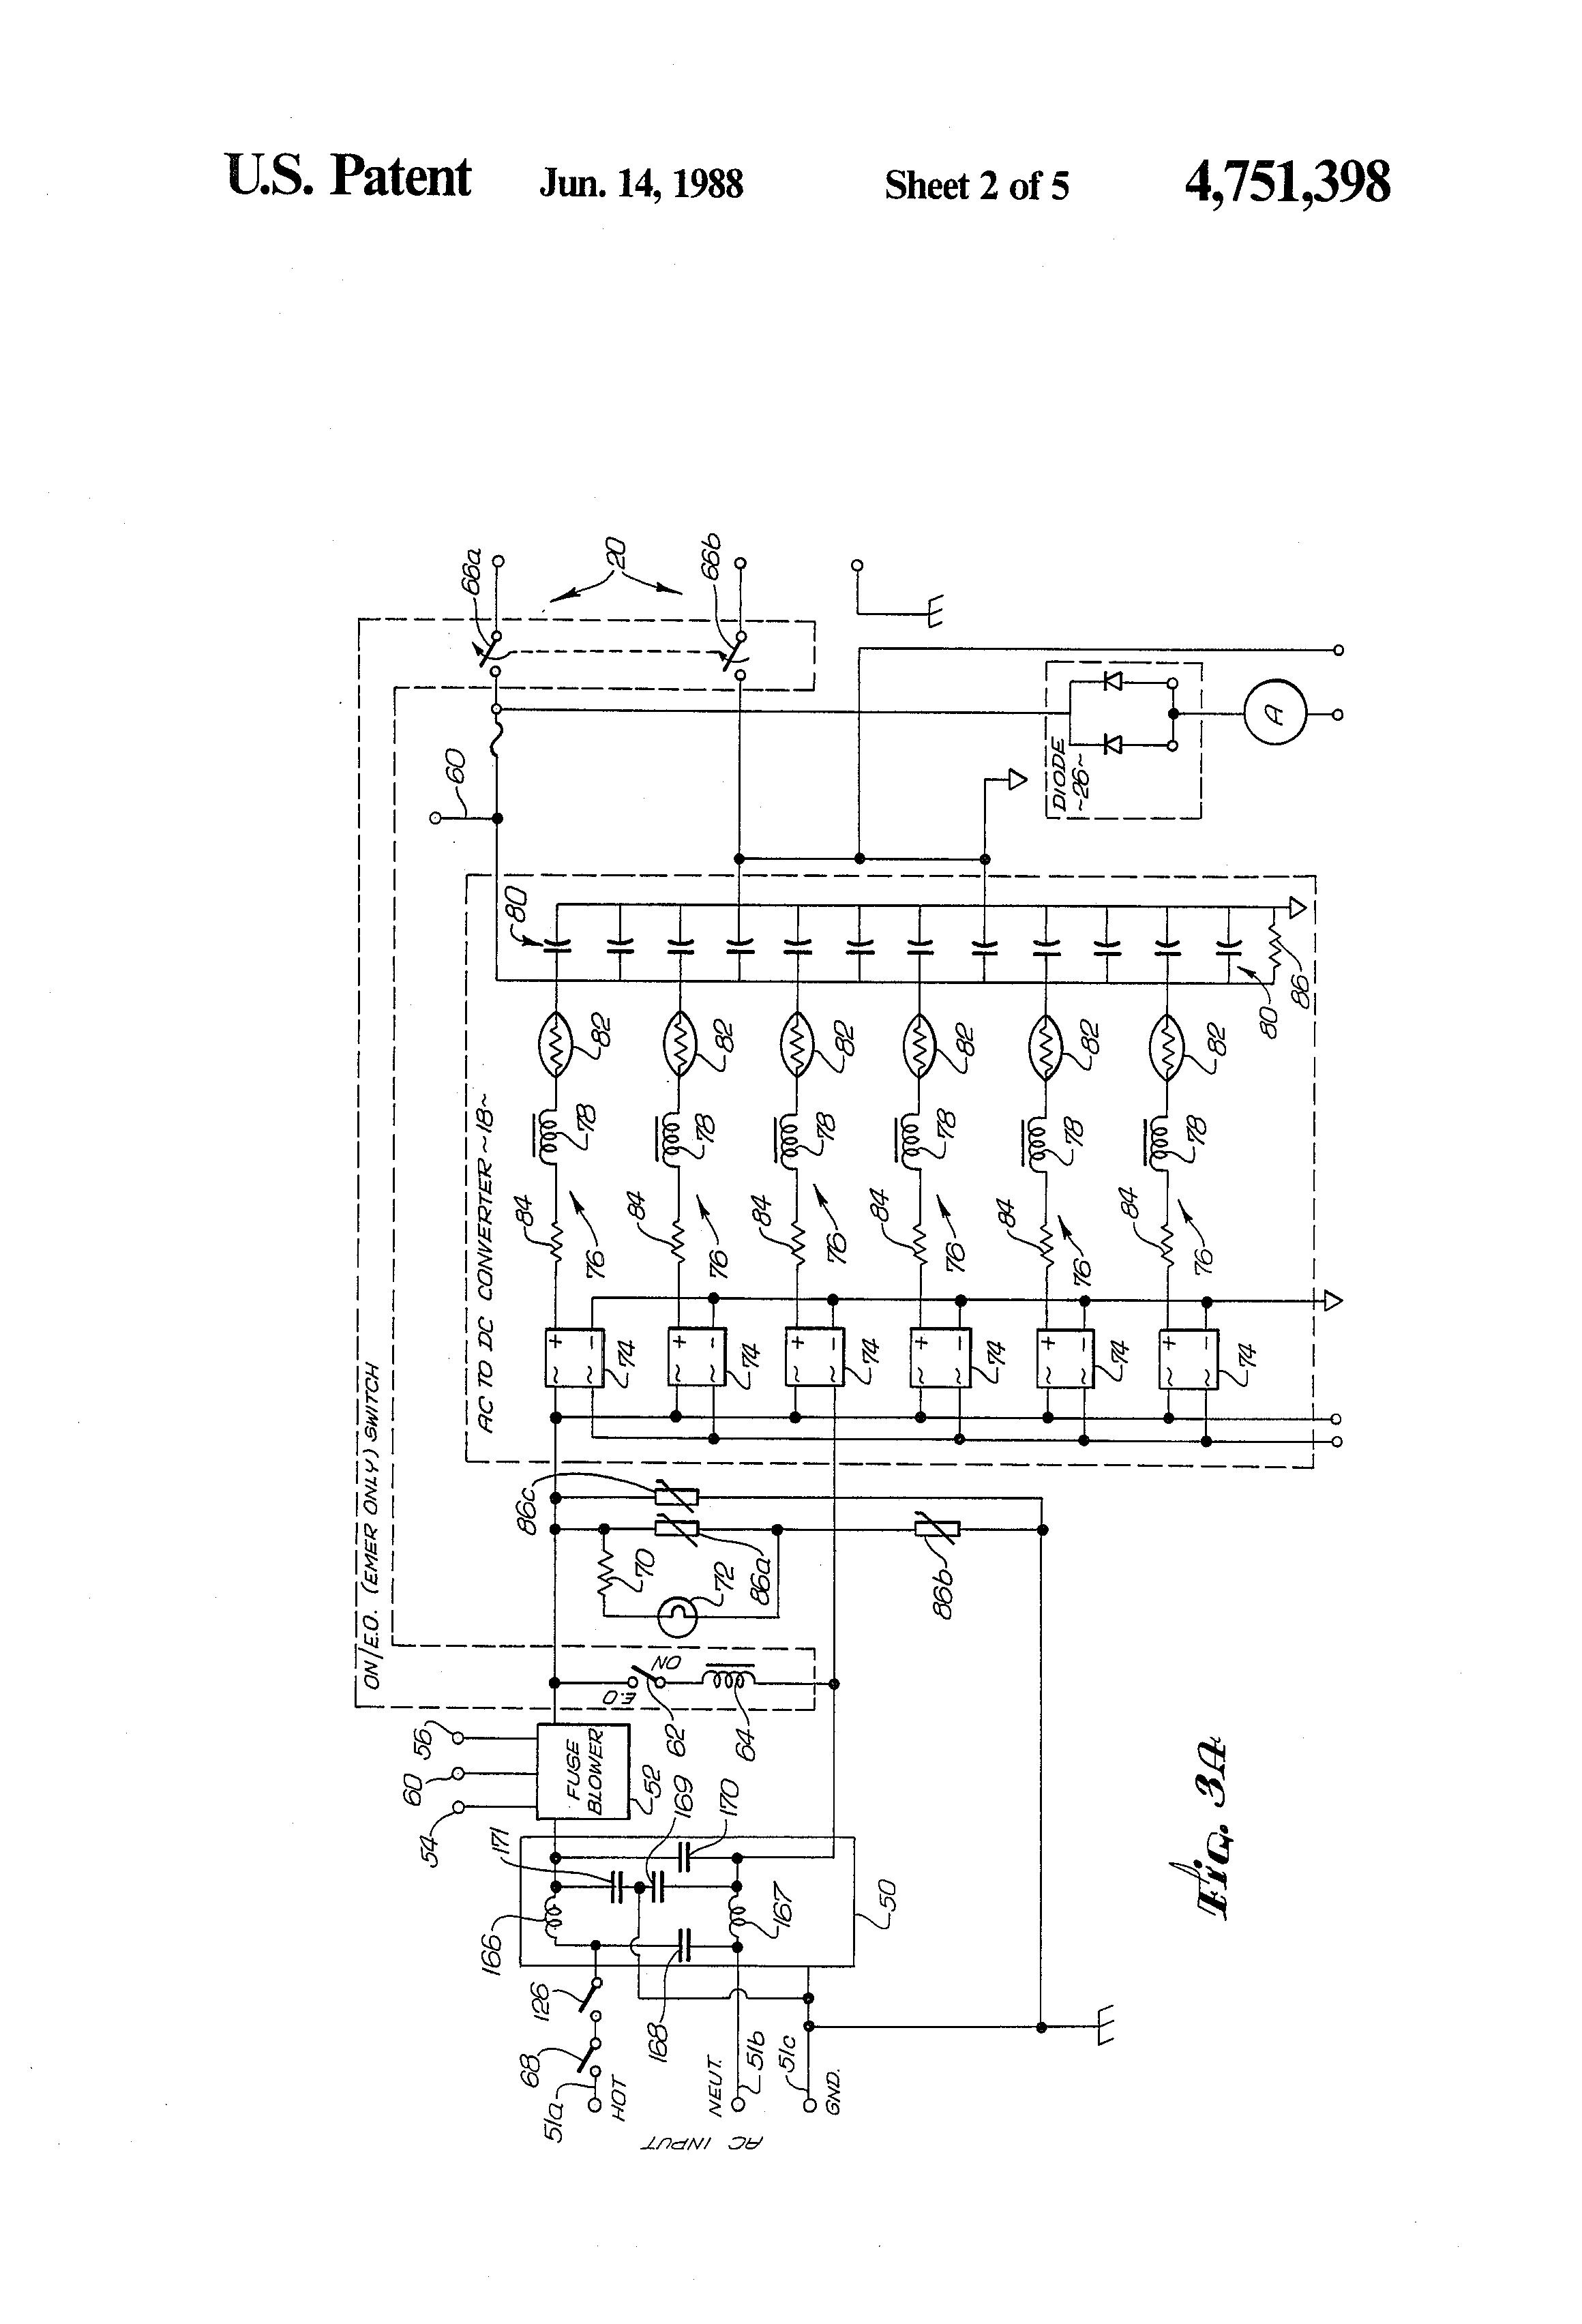 Diagram Bodine Lp600 Emergency Ballast Wiring Diagram Full Version Hd Quality Wiring Diagram Expertwiring Aikikai Des Lacs Fr